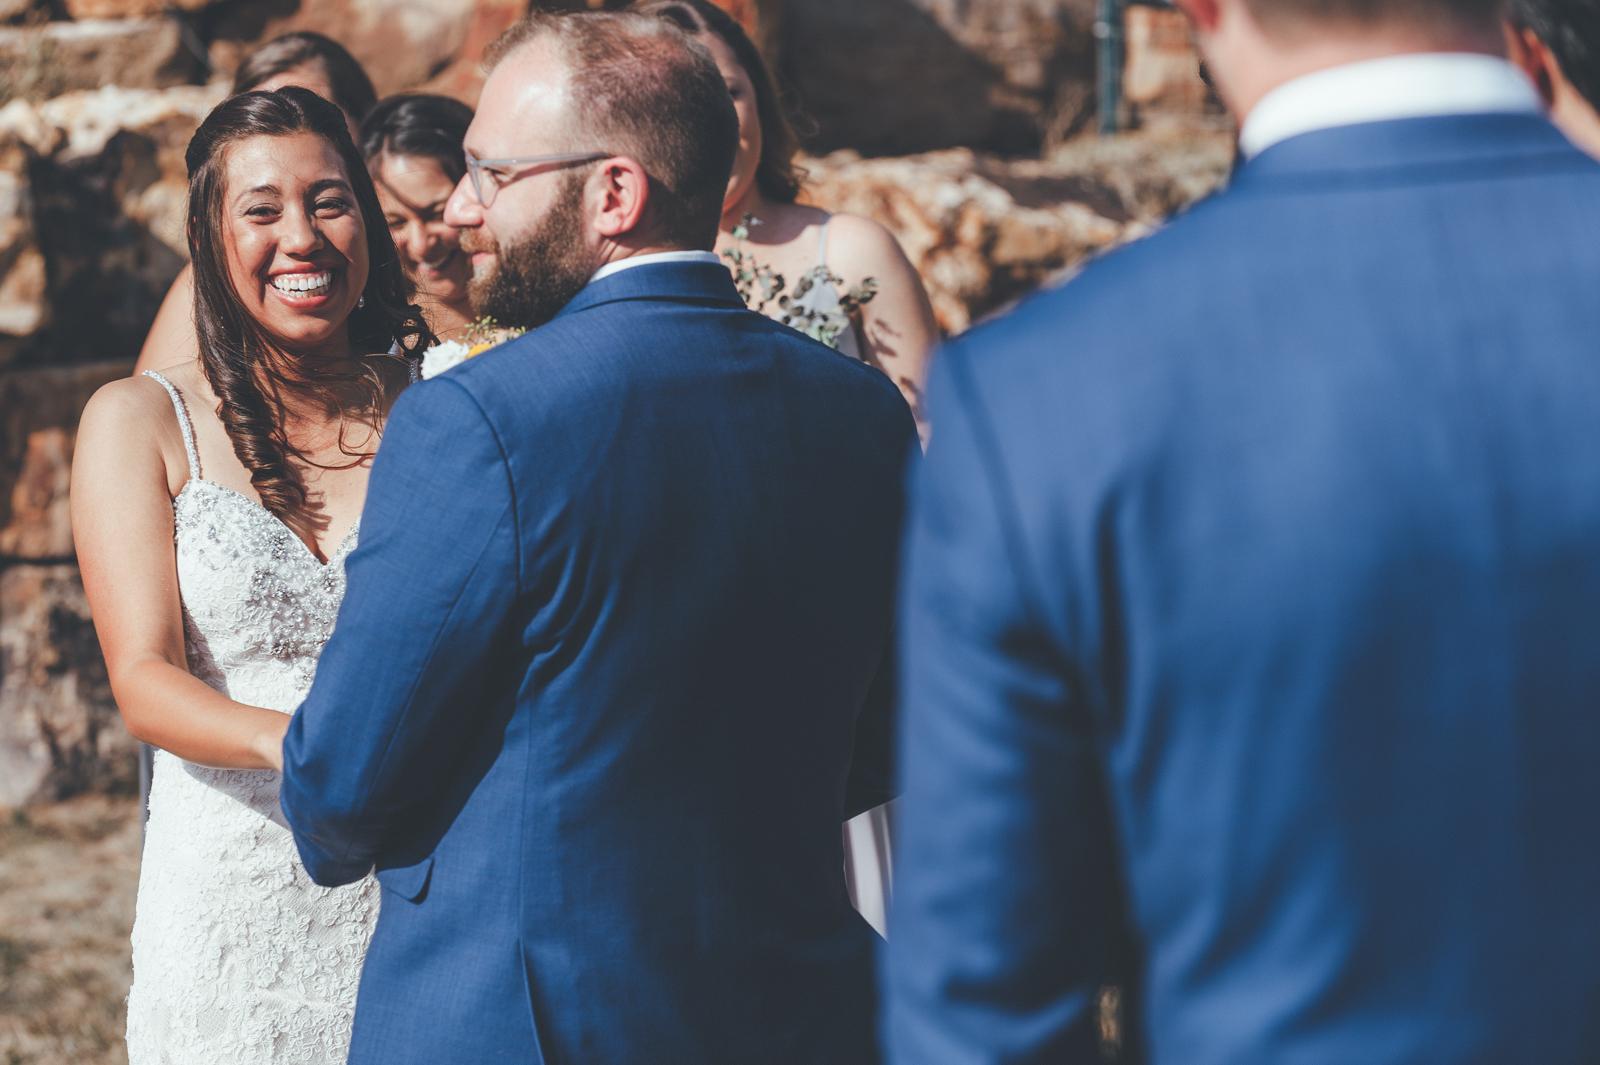 ChadFahnestockPhotography-estes-park-wedding-photography-019.jpg